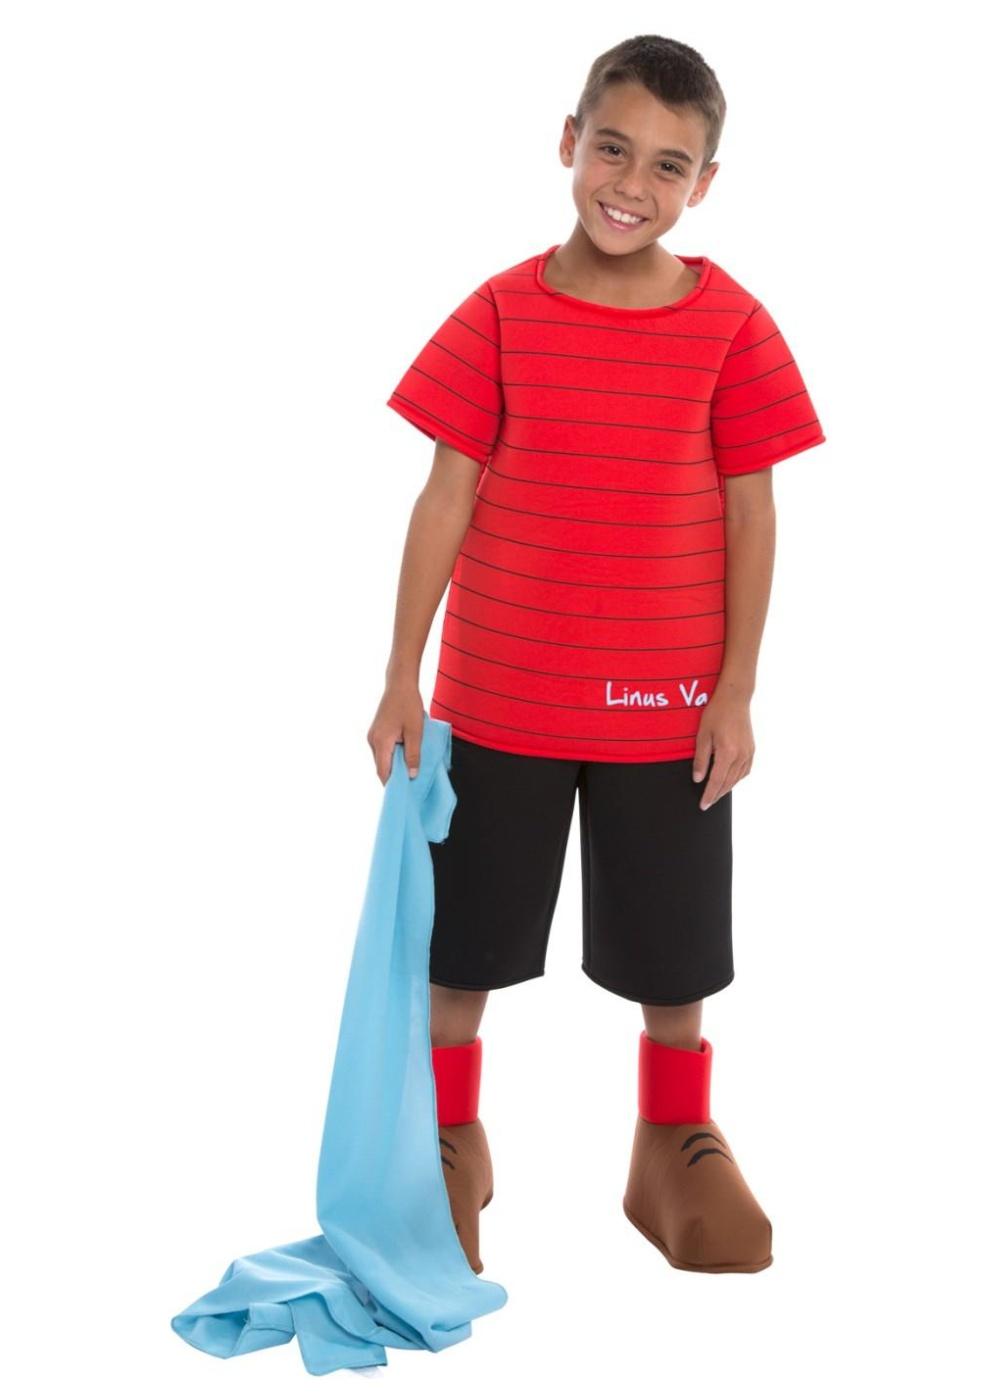 Peanuts Linus Boys Costume Show Costumes